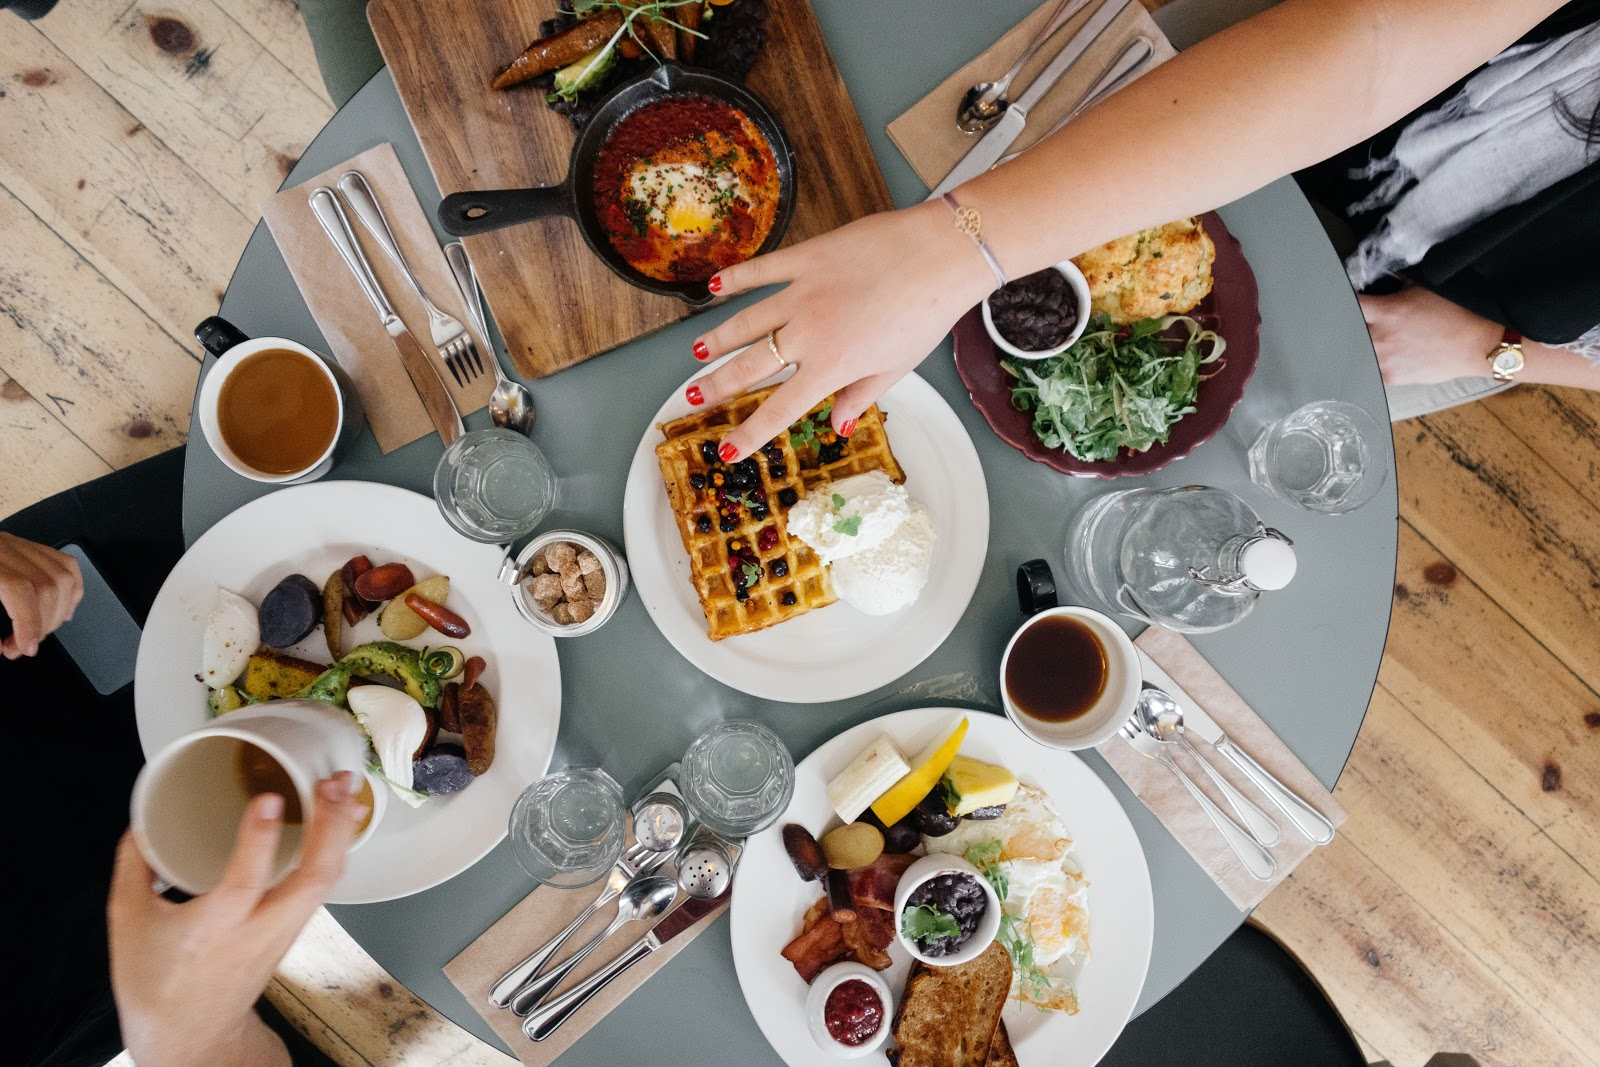 , Five Reasons Why You Should Meal Plan #GiveUpBinningFood